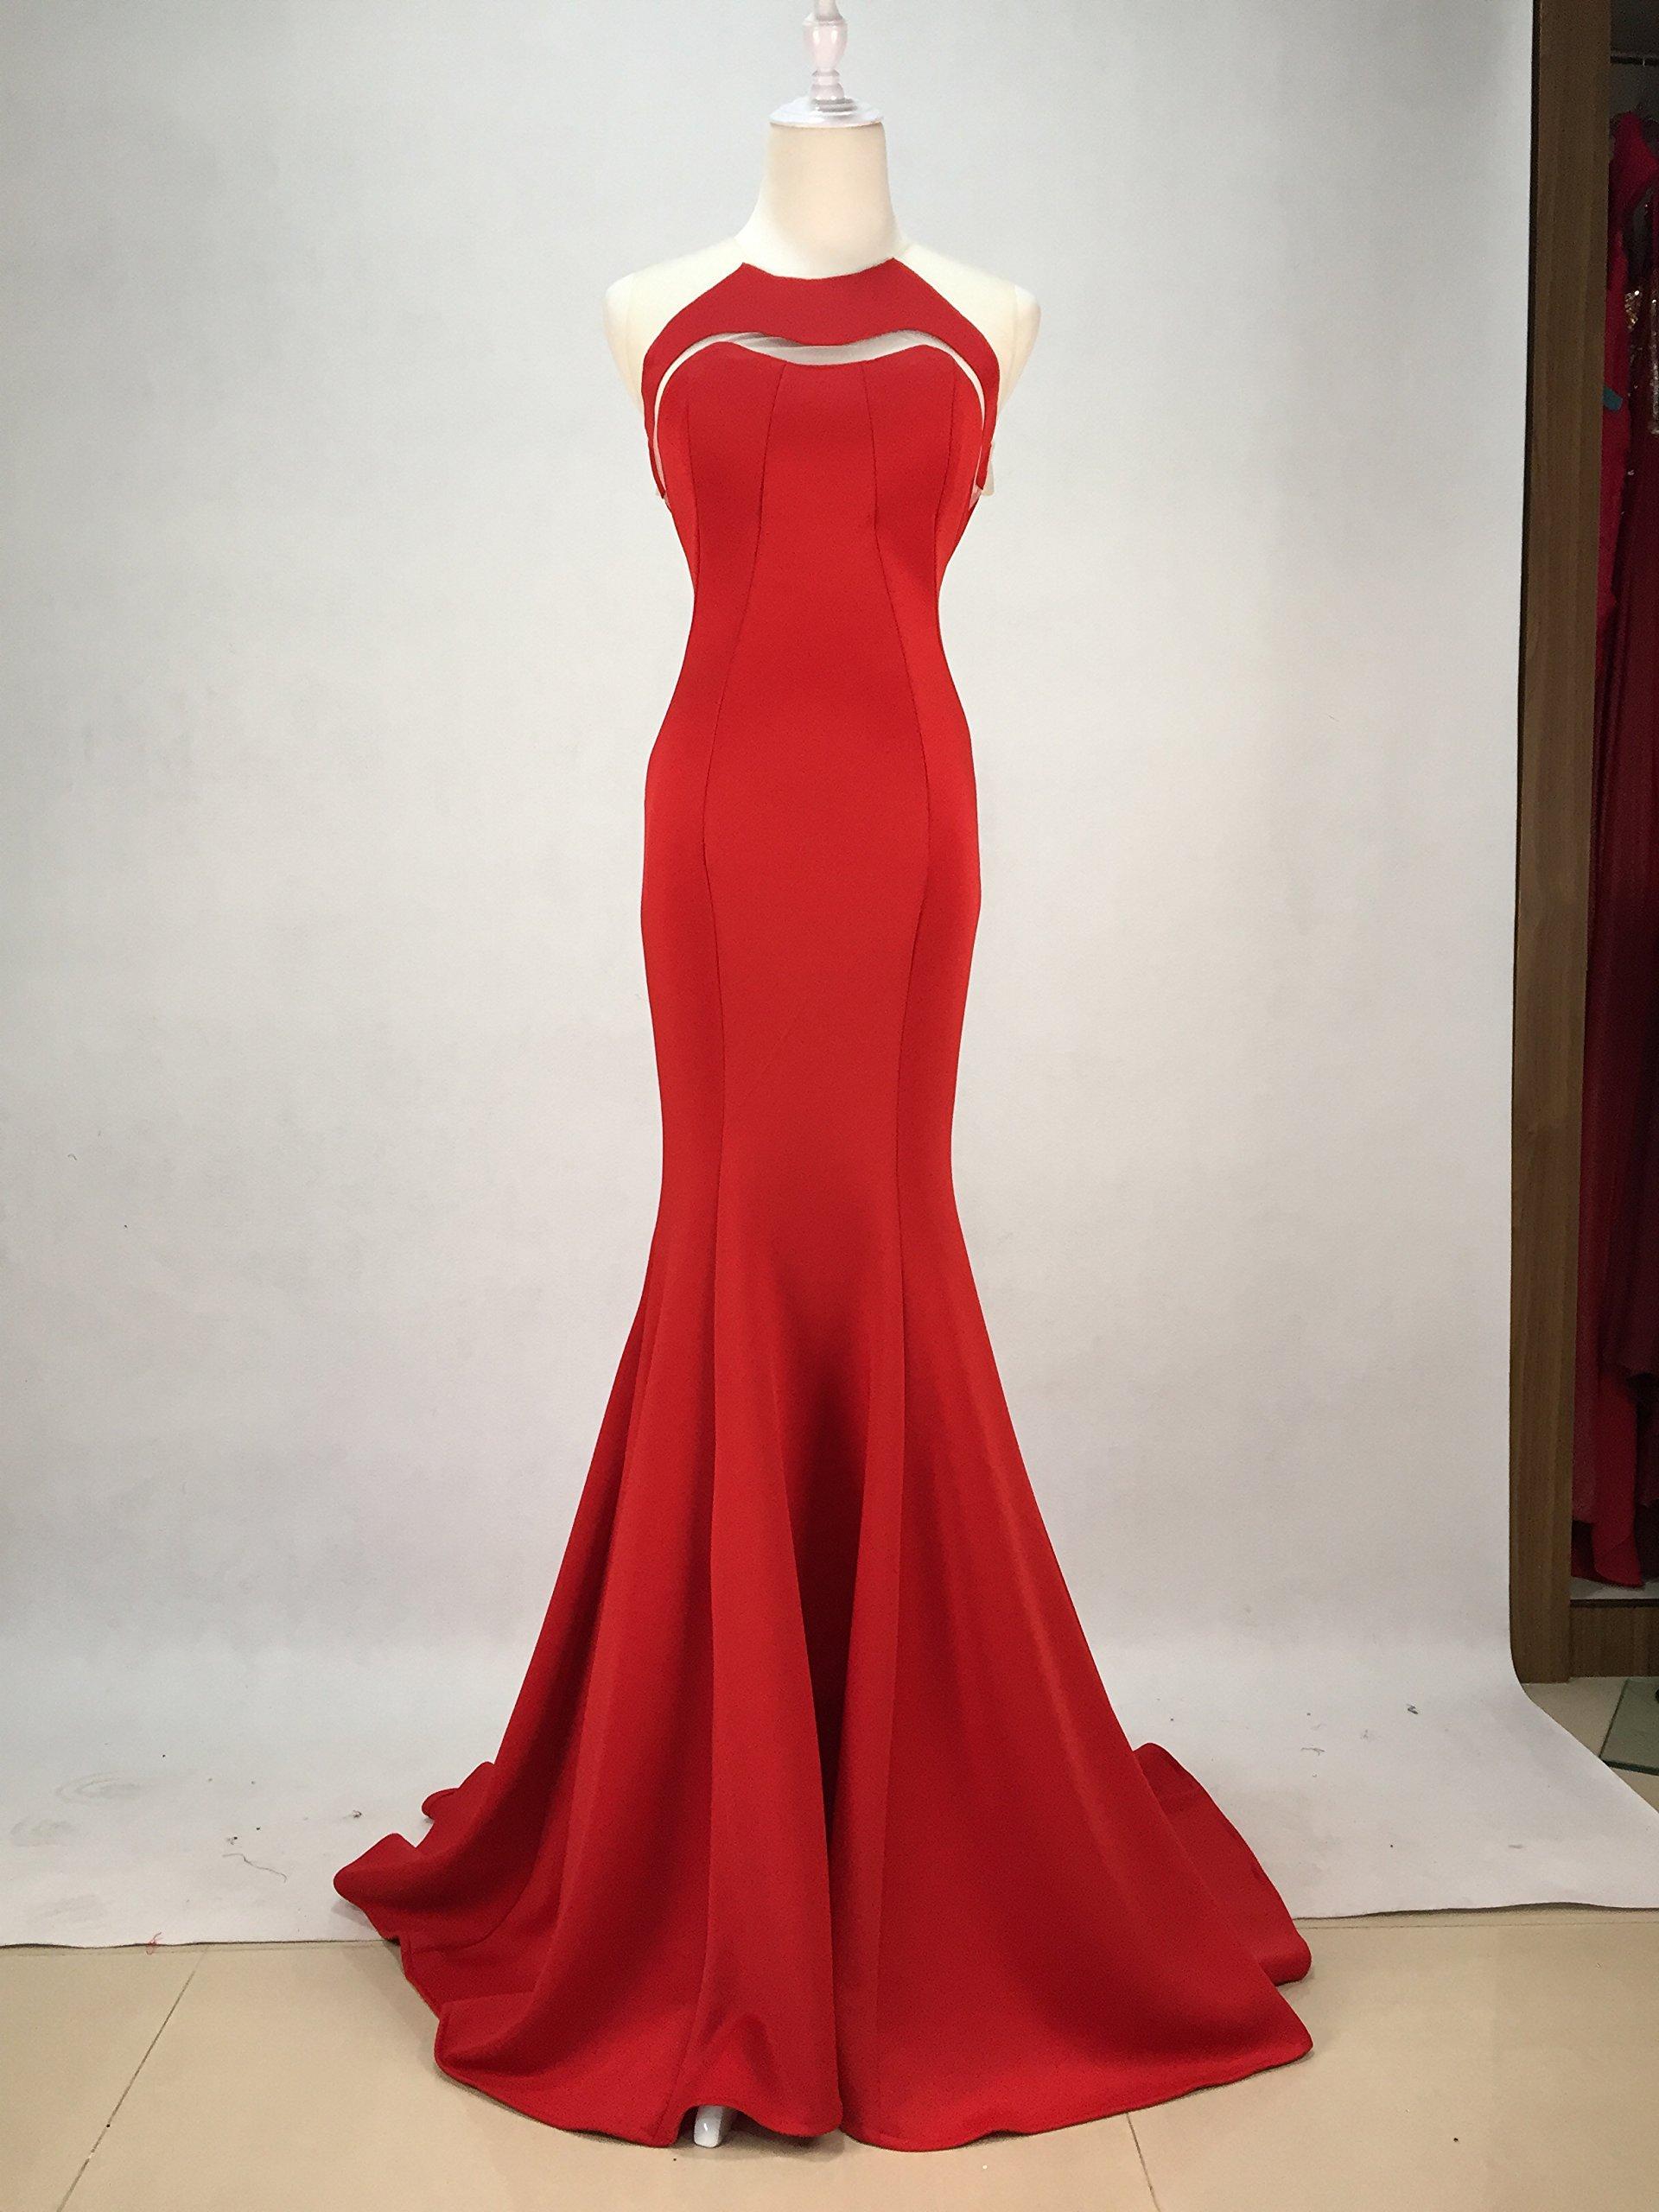 Gypsophila Women Fishtail Evening Dress Prom Gown 2016 (4, Red) by Gypsophila